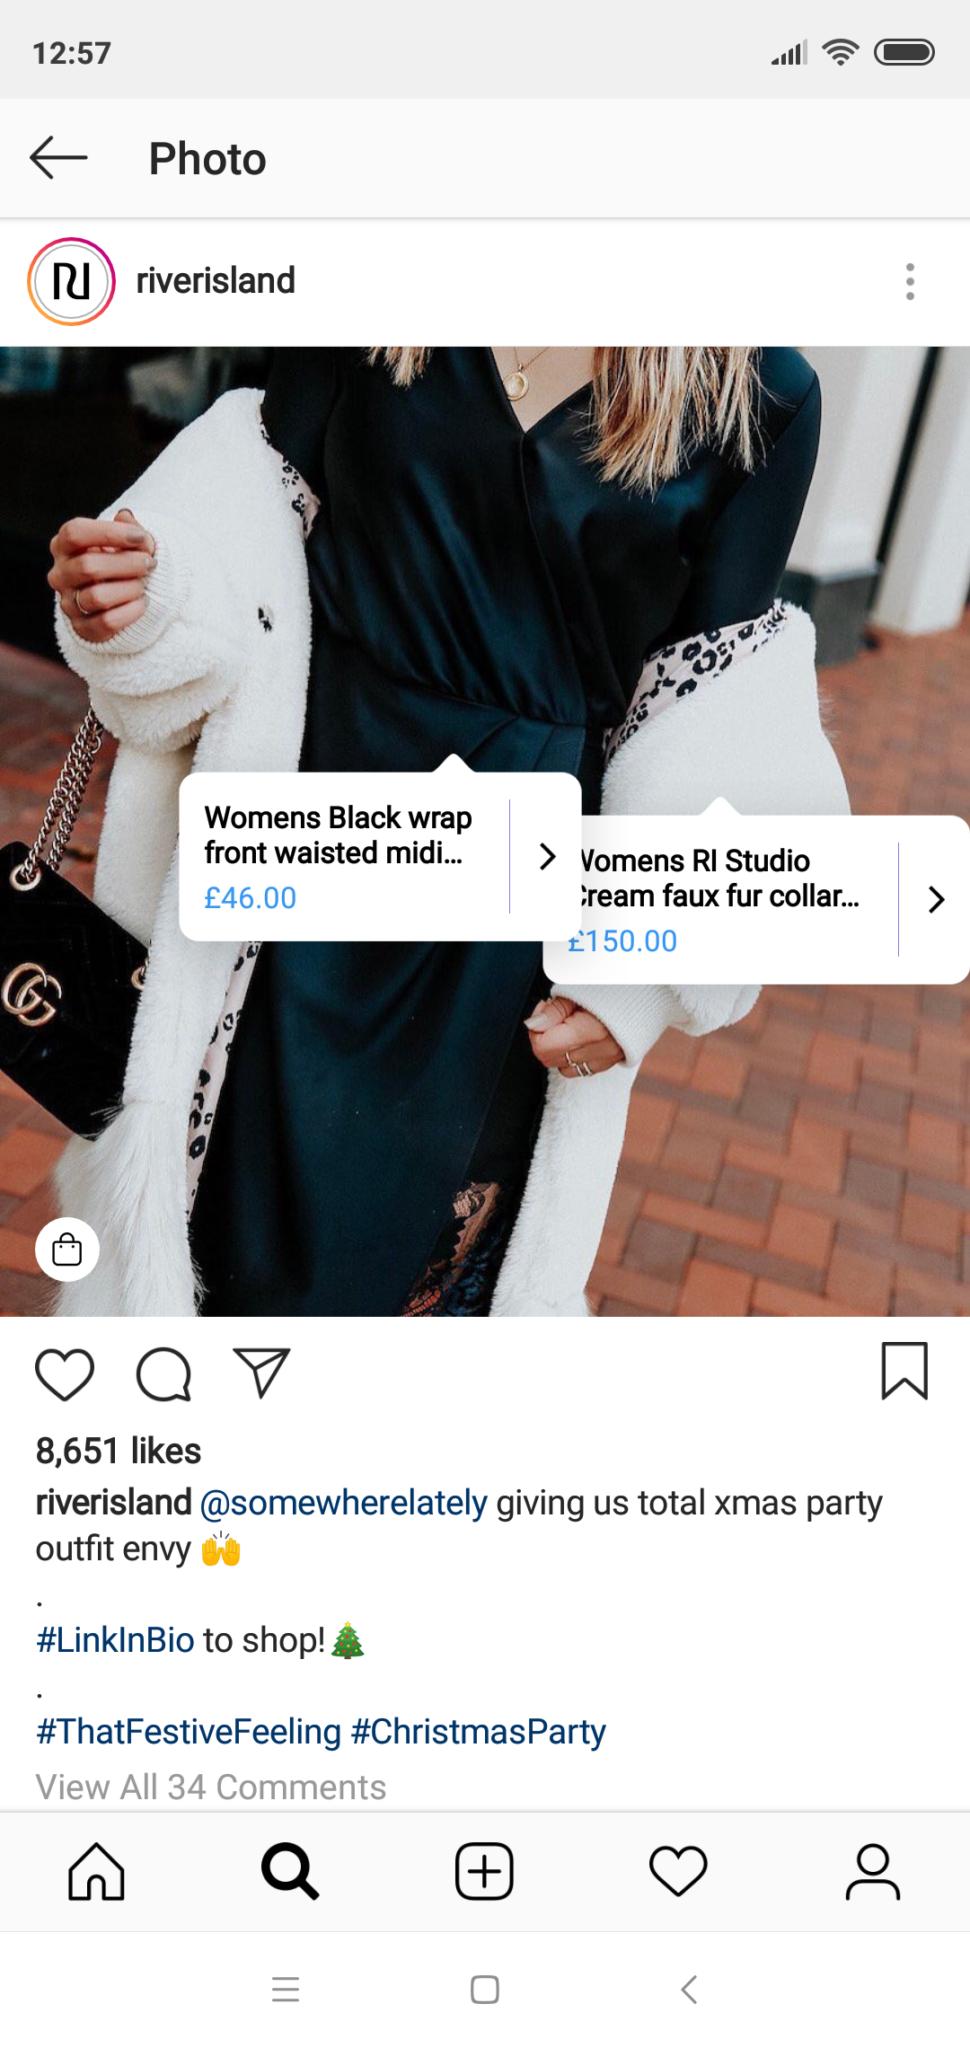 Instagram Shoppable Posts River Island